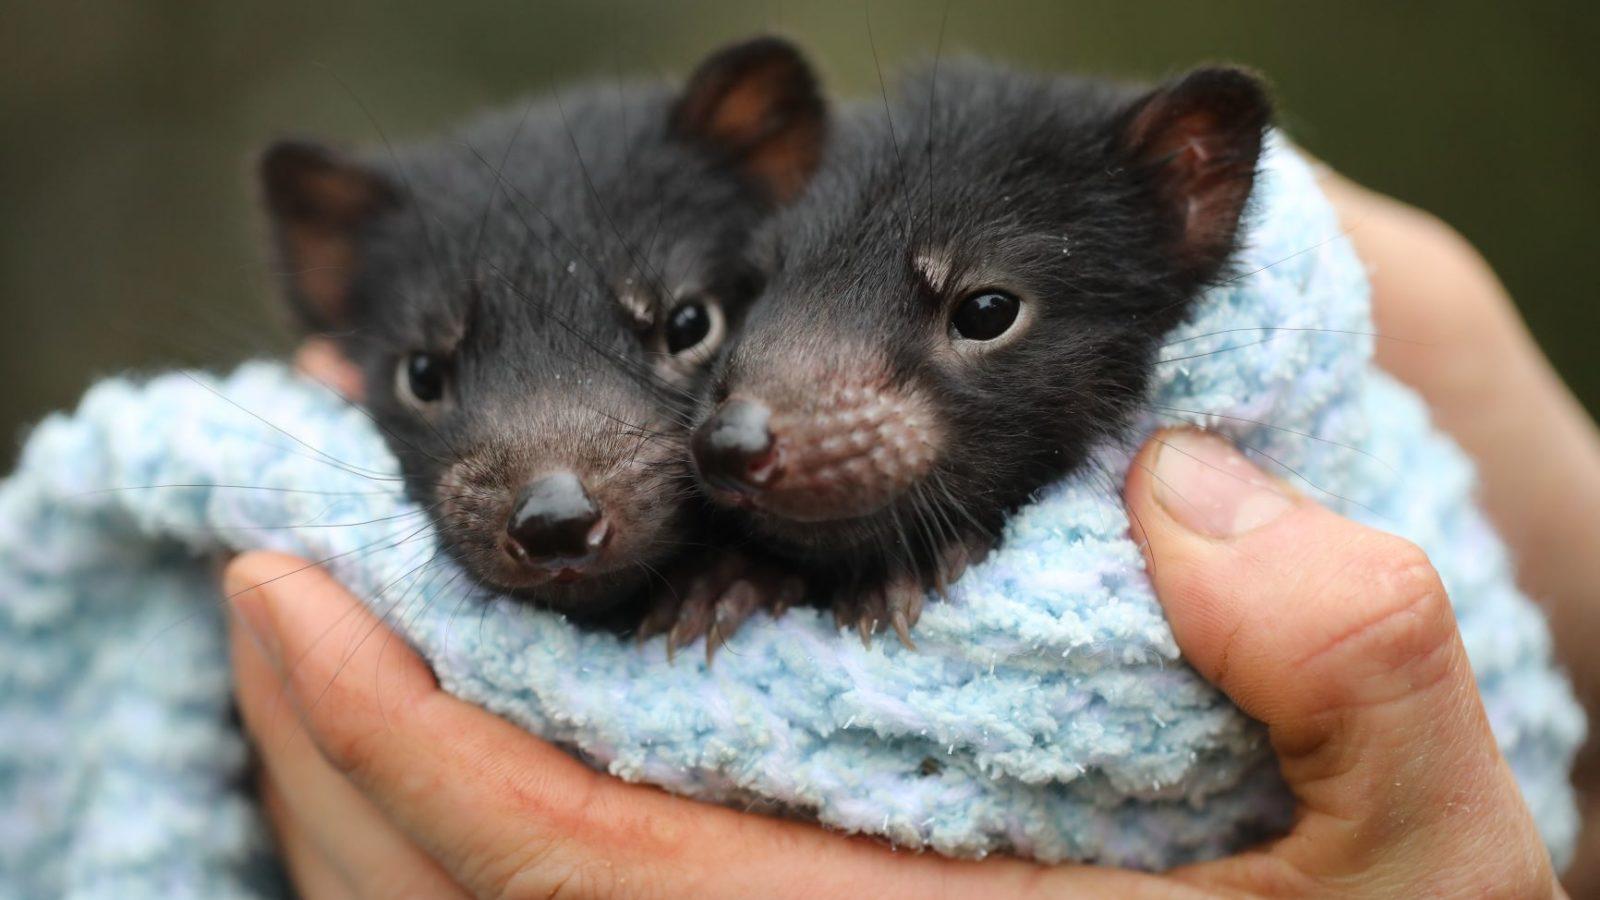 Aussie Ark Tassie Devil joeys Itchy and Scratchy